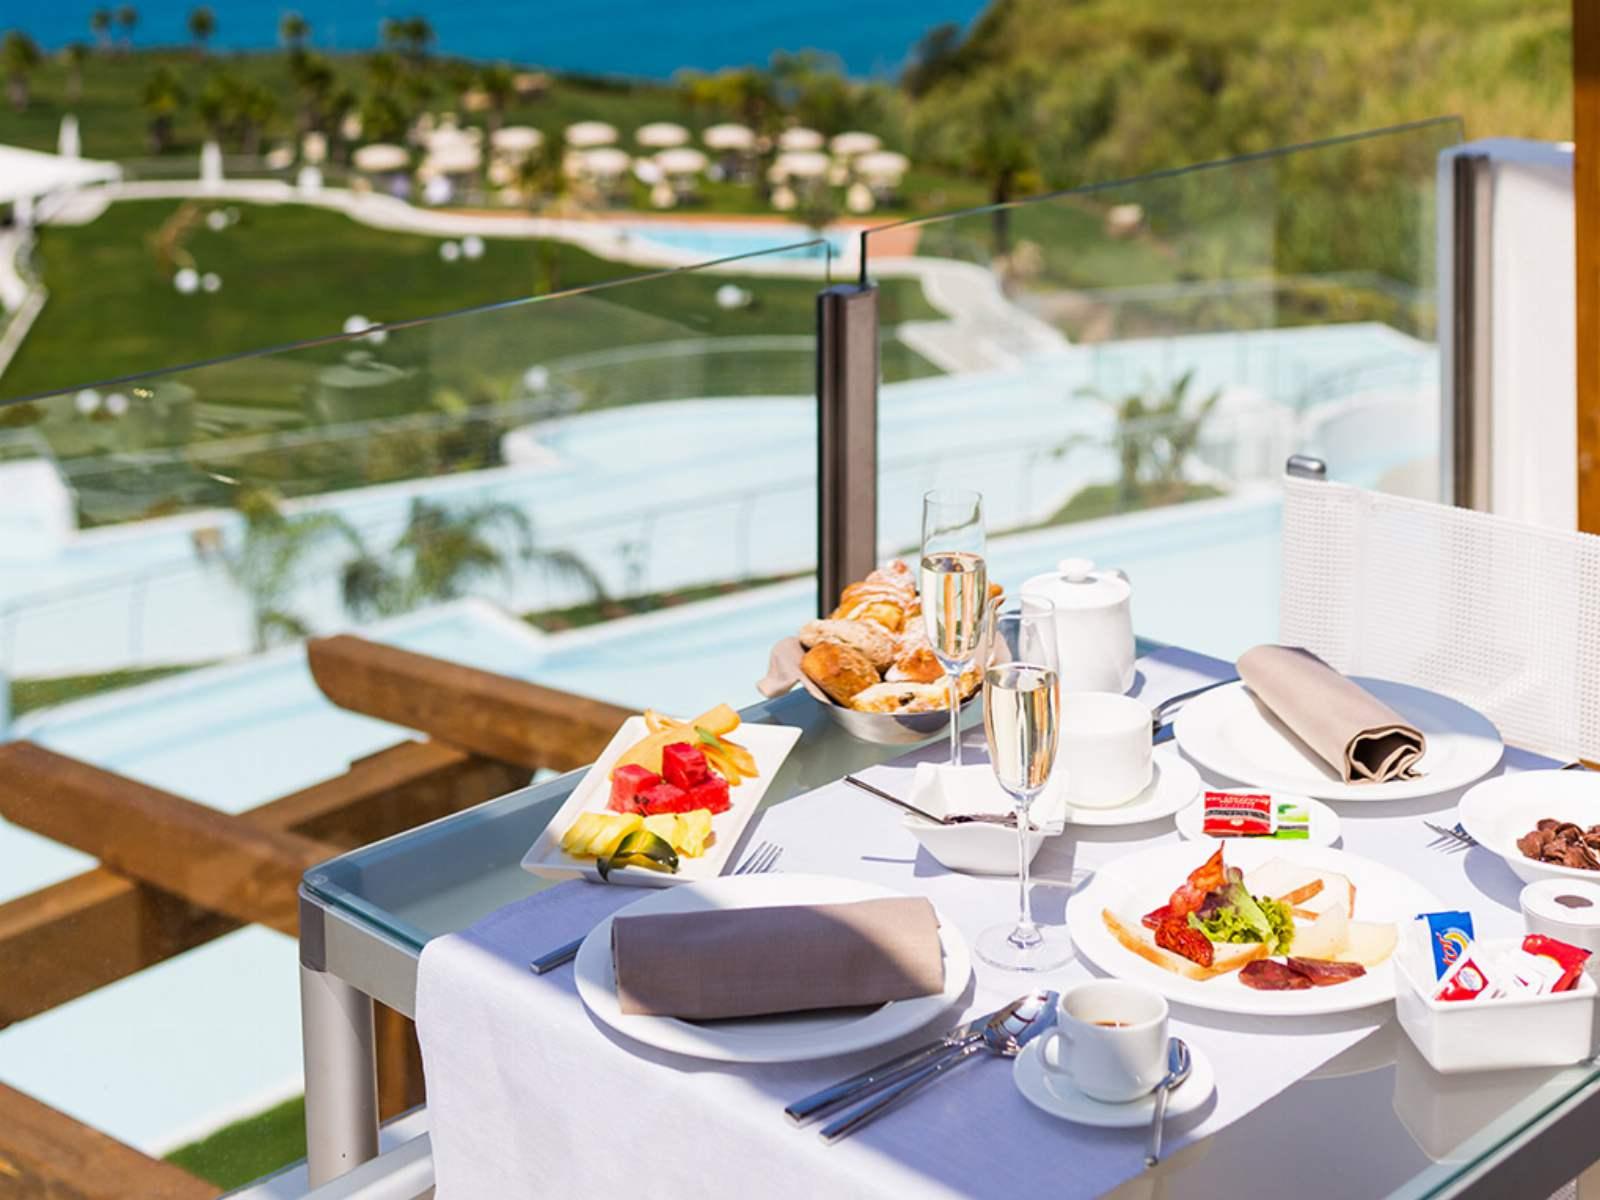 Infinity Resort & Spa: room / property / locale photo. Image 5